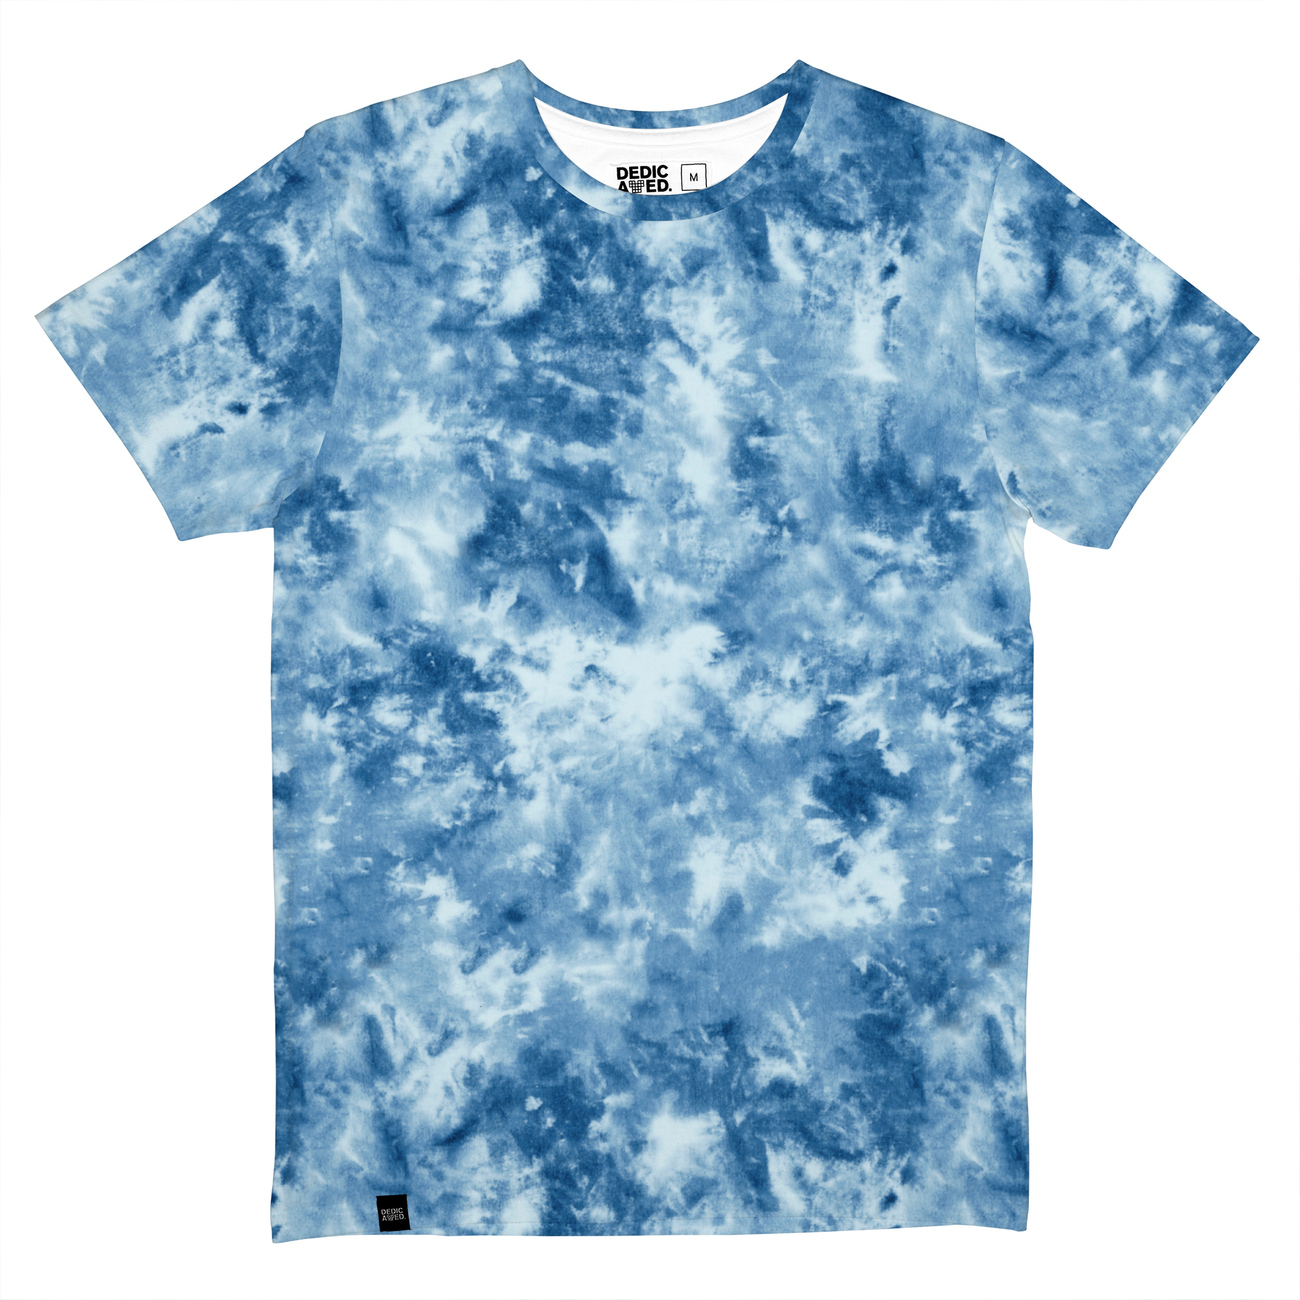 T-shirt Stockholm Tie Dye Blue